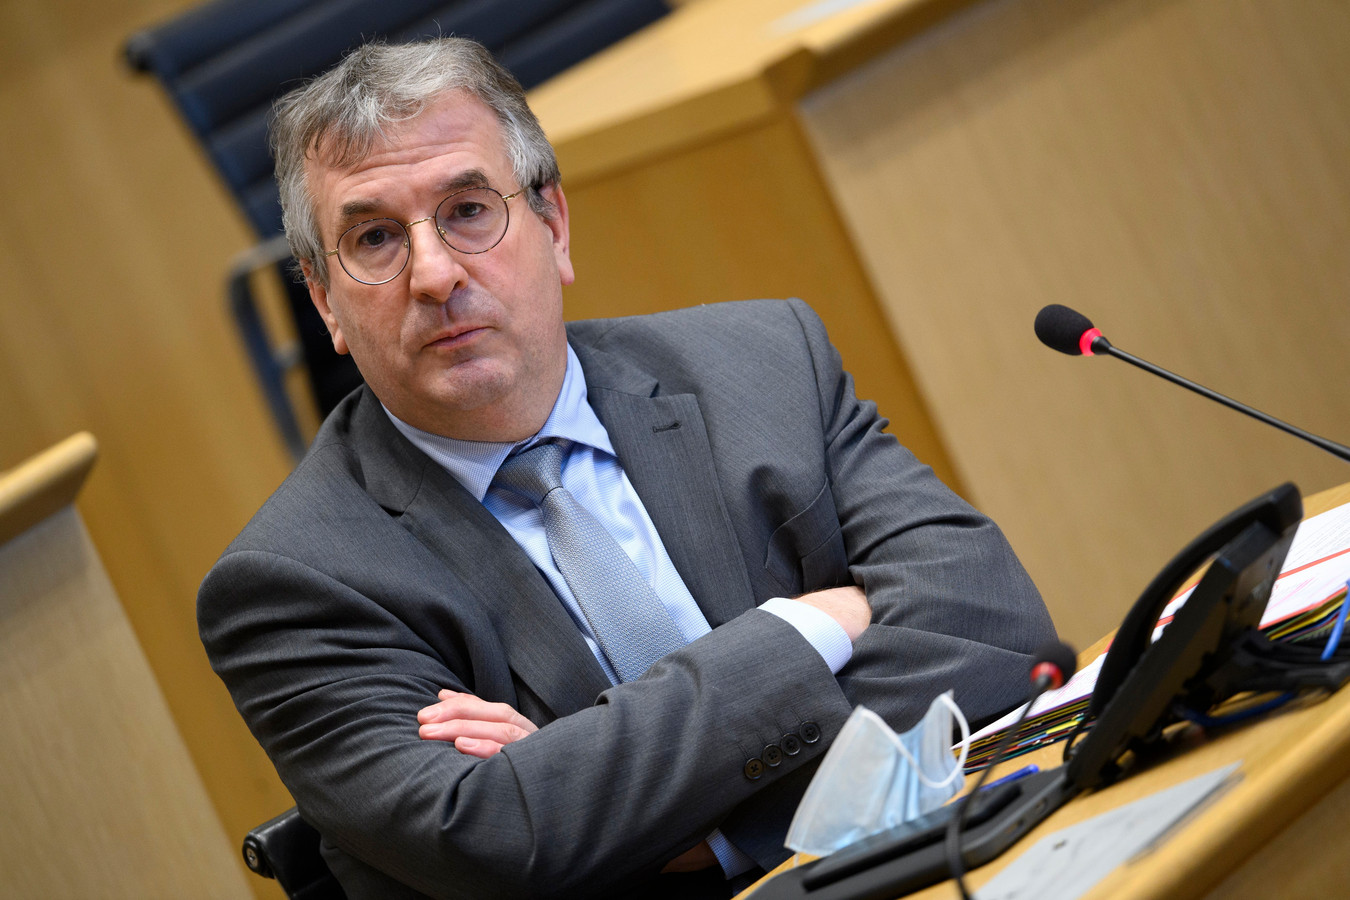 Pierre-Yves Jeholet, président de la Fédération Wallonie-Bruxelles (FWB)